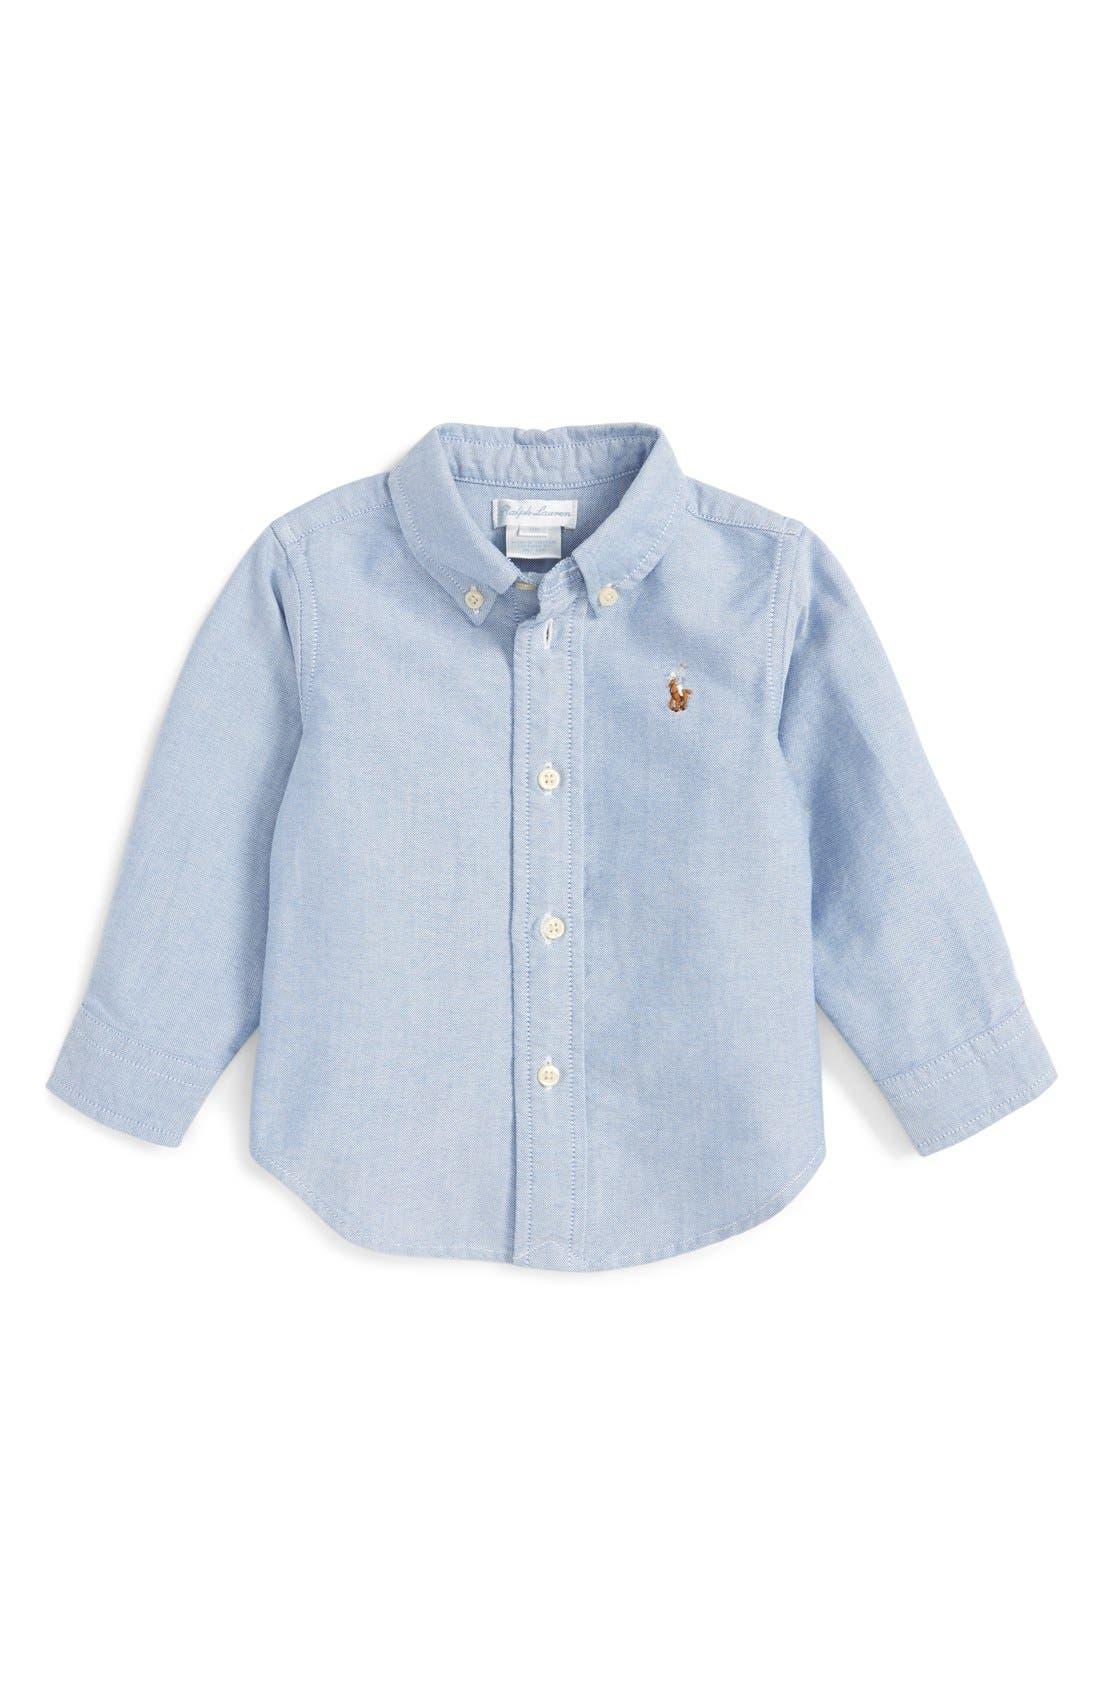 RALPH LAUREN,                             Oxford Shirt,                             Main thumbnail 1, color,                             OXFORD BLUE